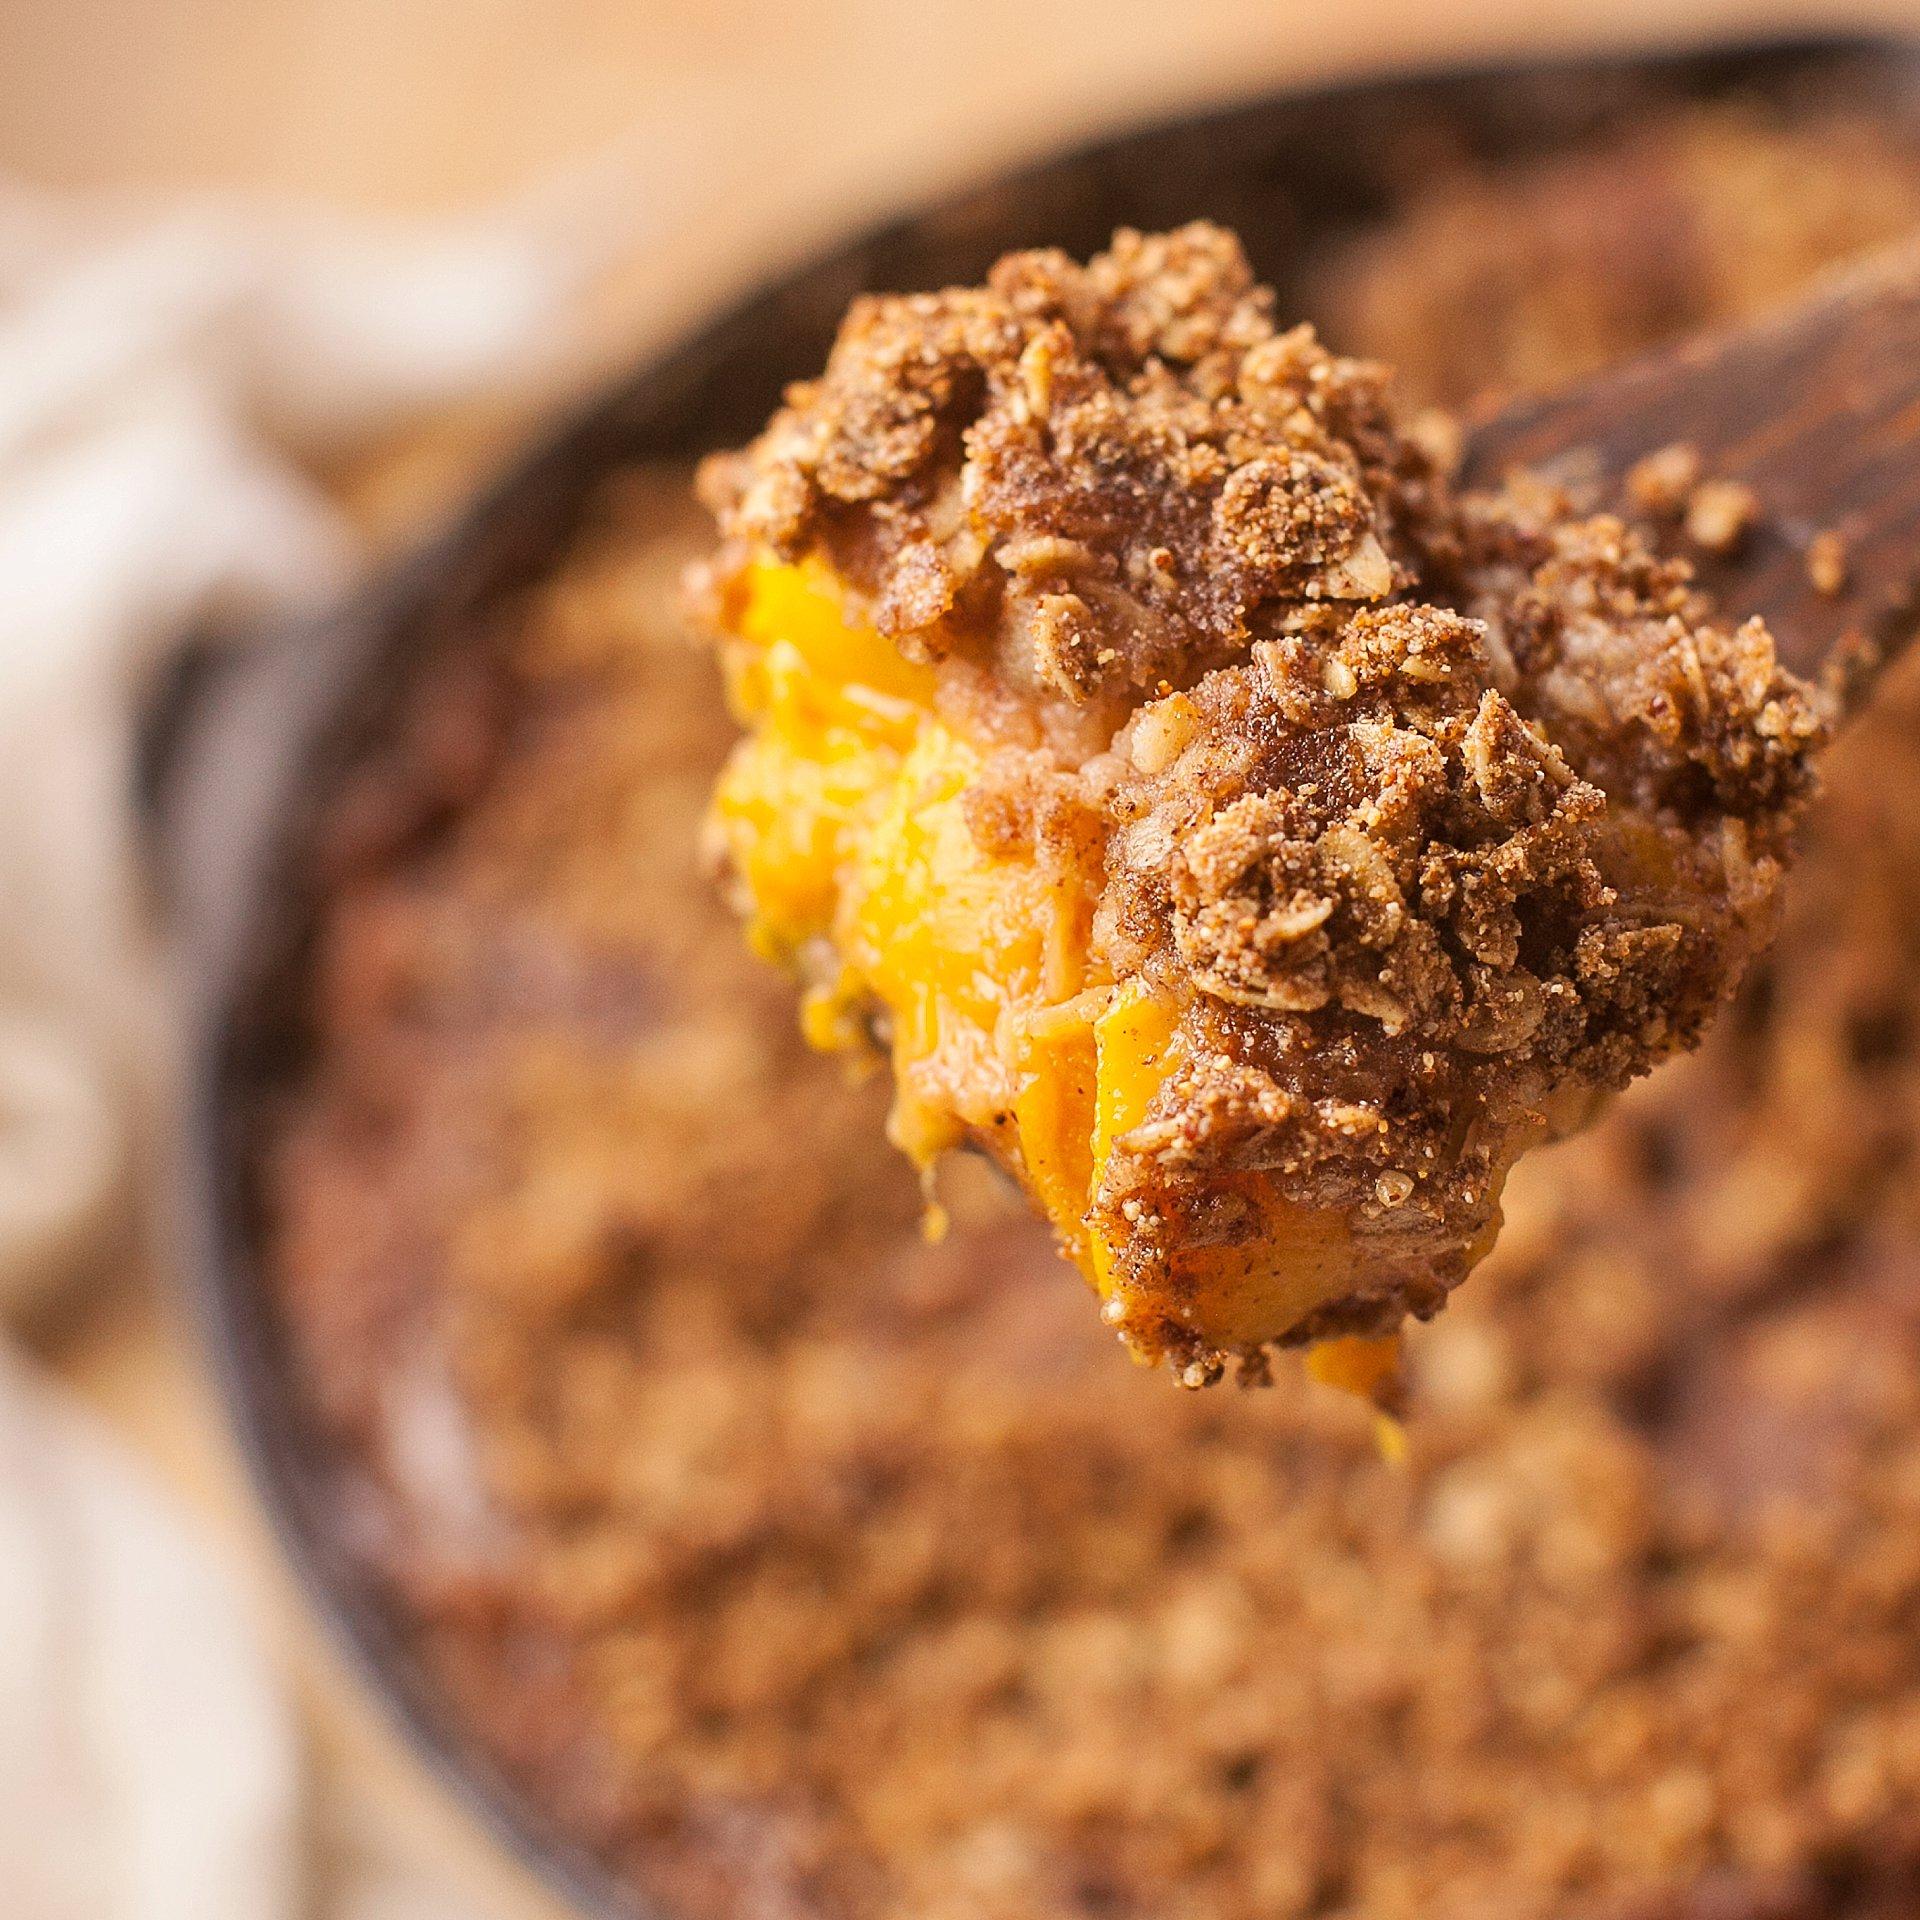 Peach Quinoa Crumble Healthy Dessert Recipe • Eat With Tom